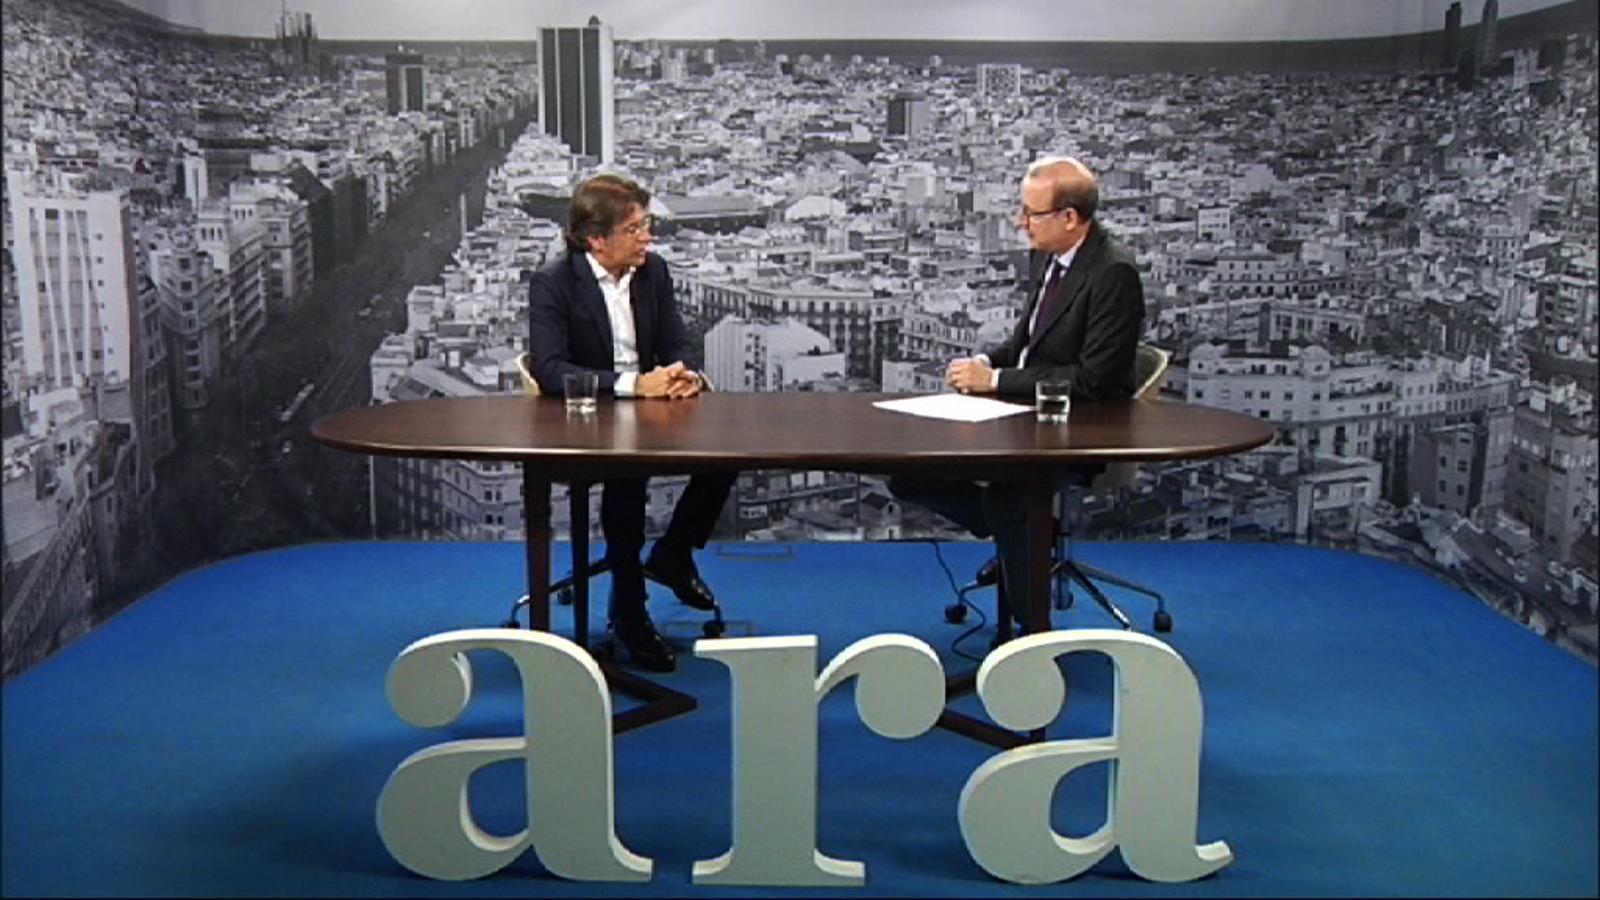 Entrevista d'Antoni Bassas a Toni Freixa